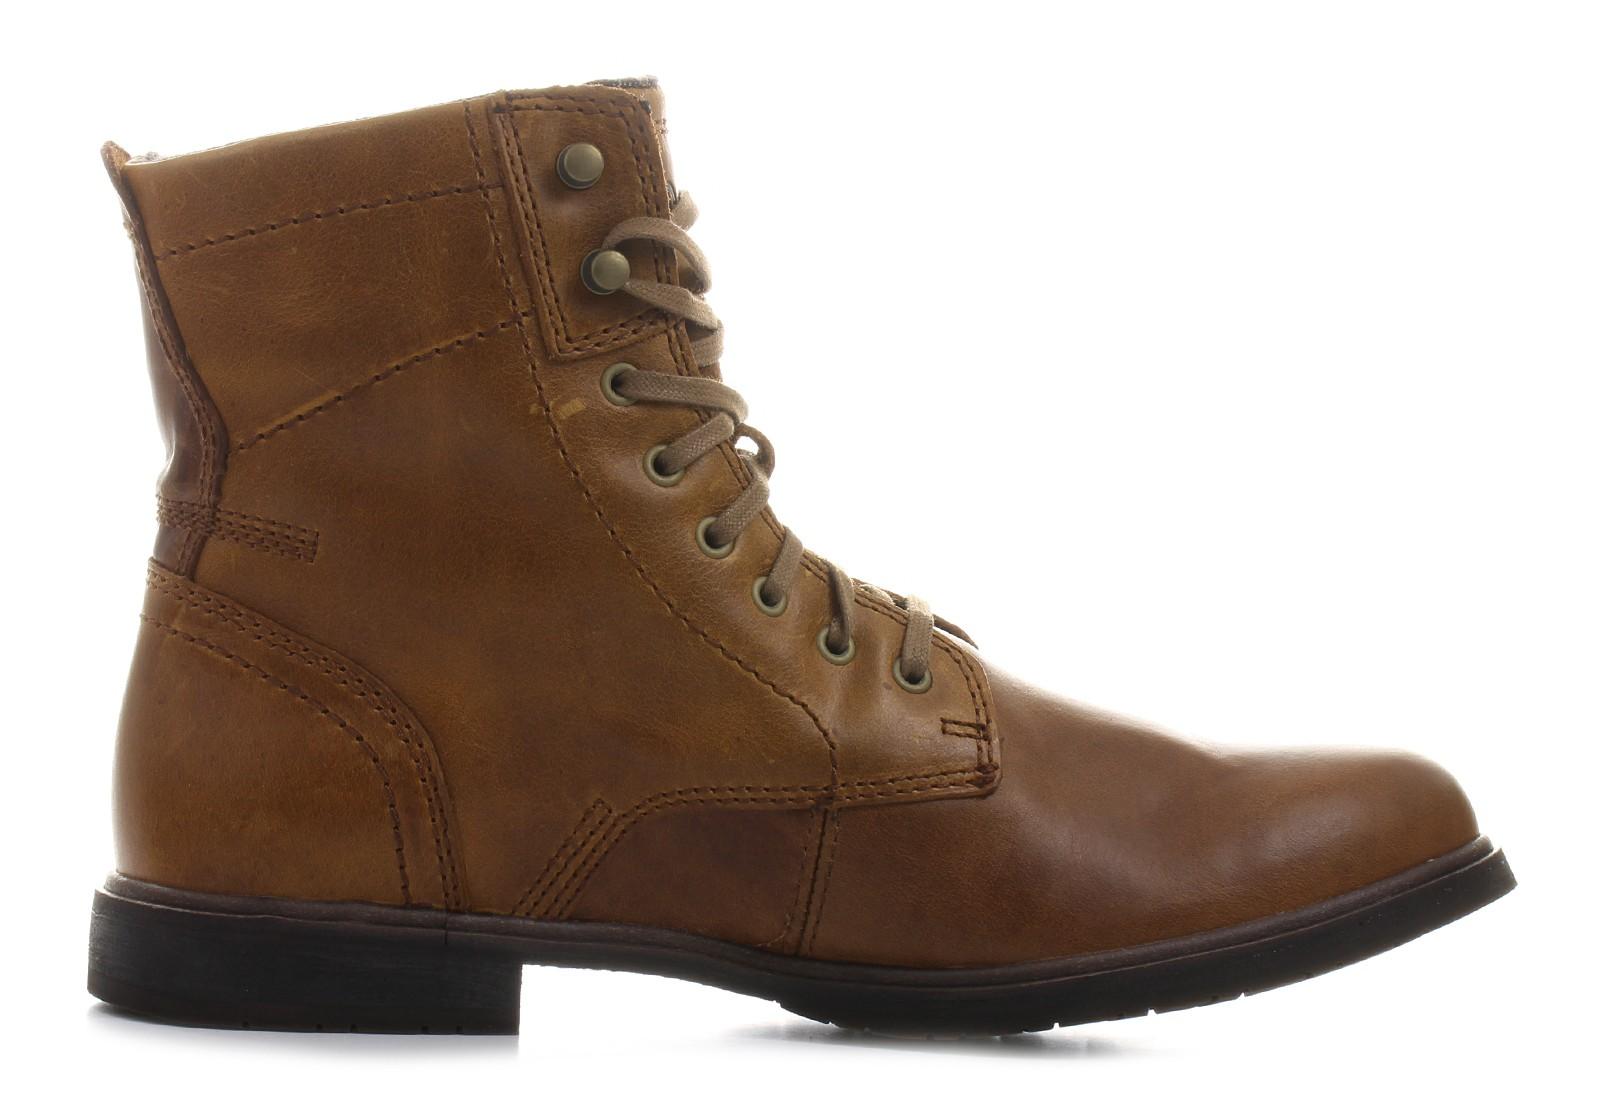 Cat Boots Orson Ii 721933 Brn Online Shop For